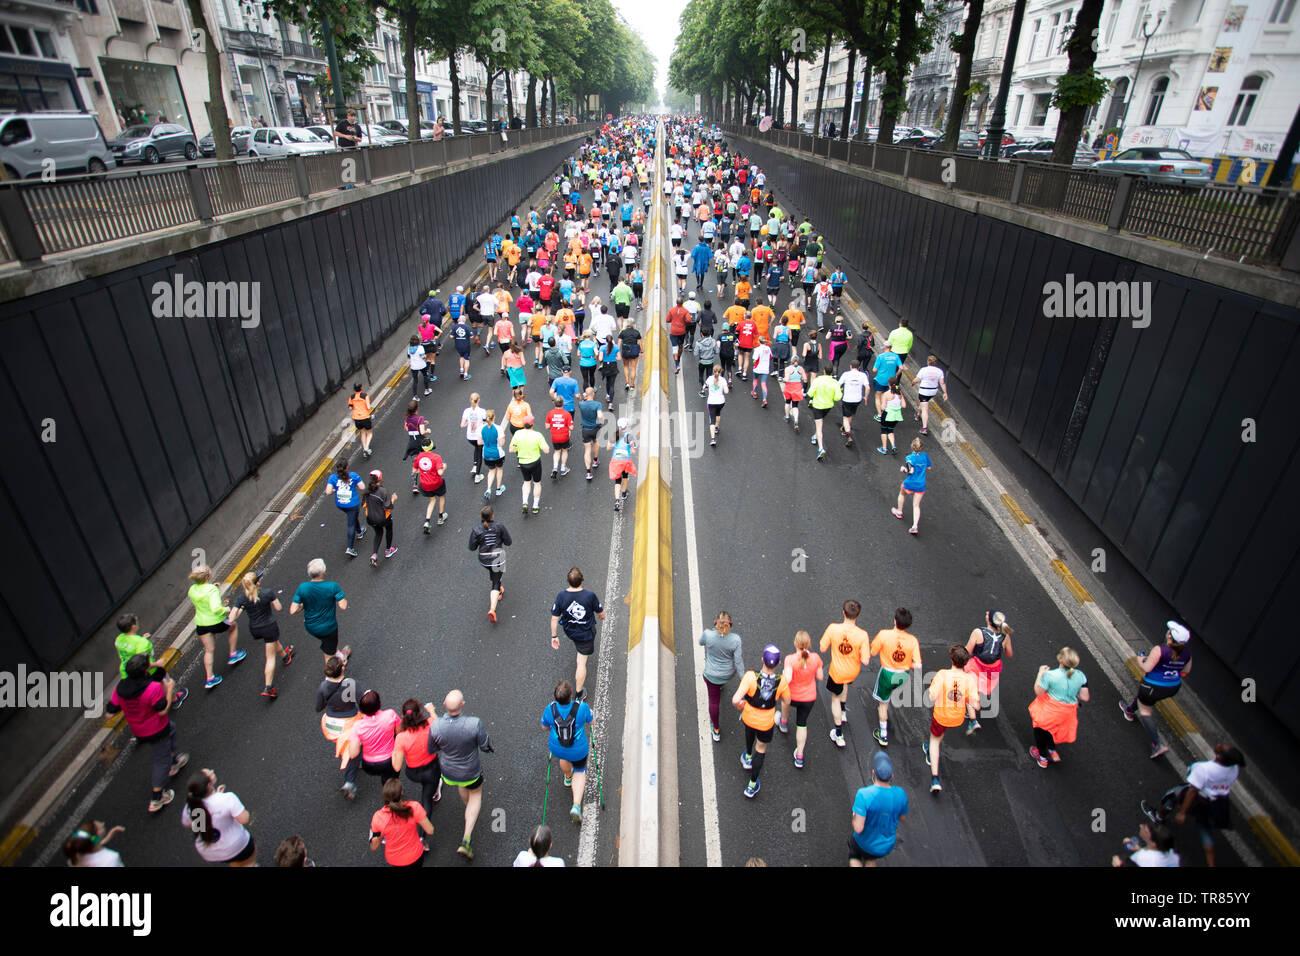 Brussels 20 km, running Brussels 20 km, half marathon, Brussels, Belgium - Stock Image